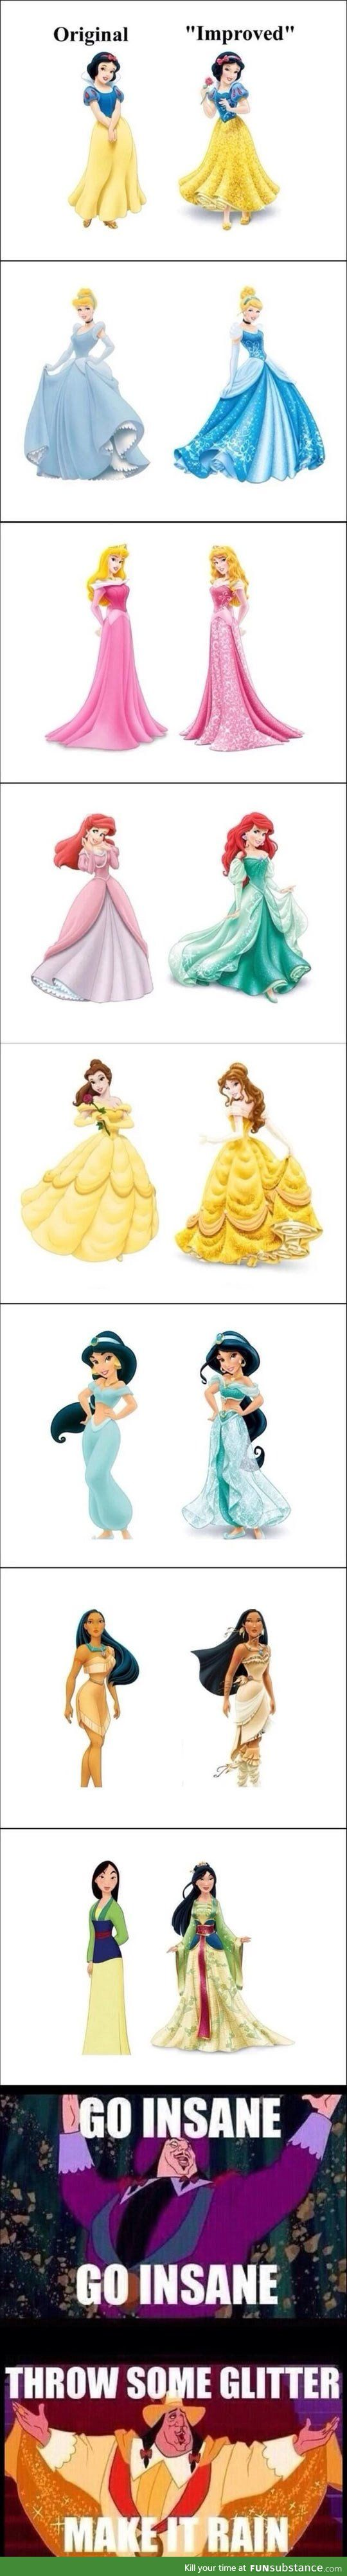 Improved Versions of Disney Princesses - FunSubstance